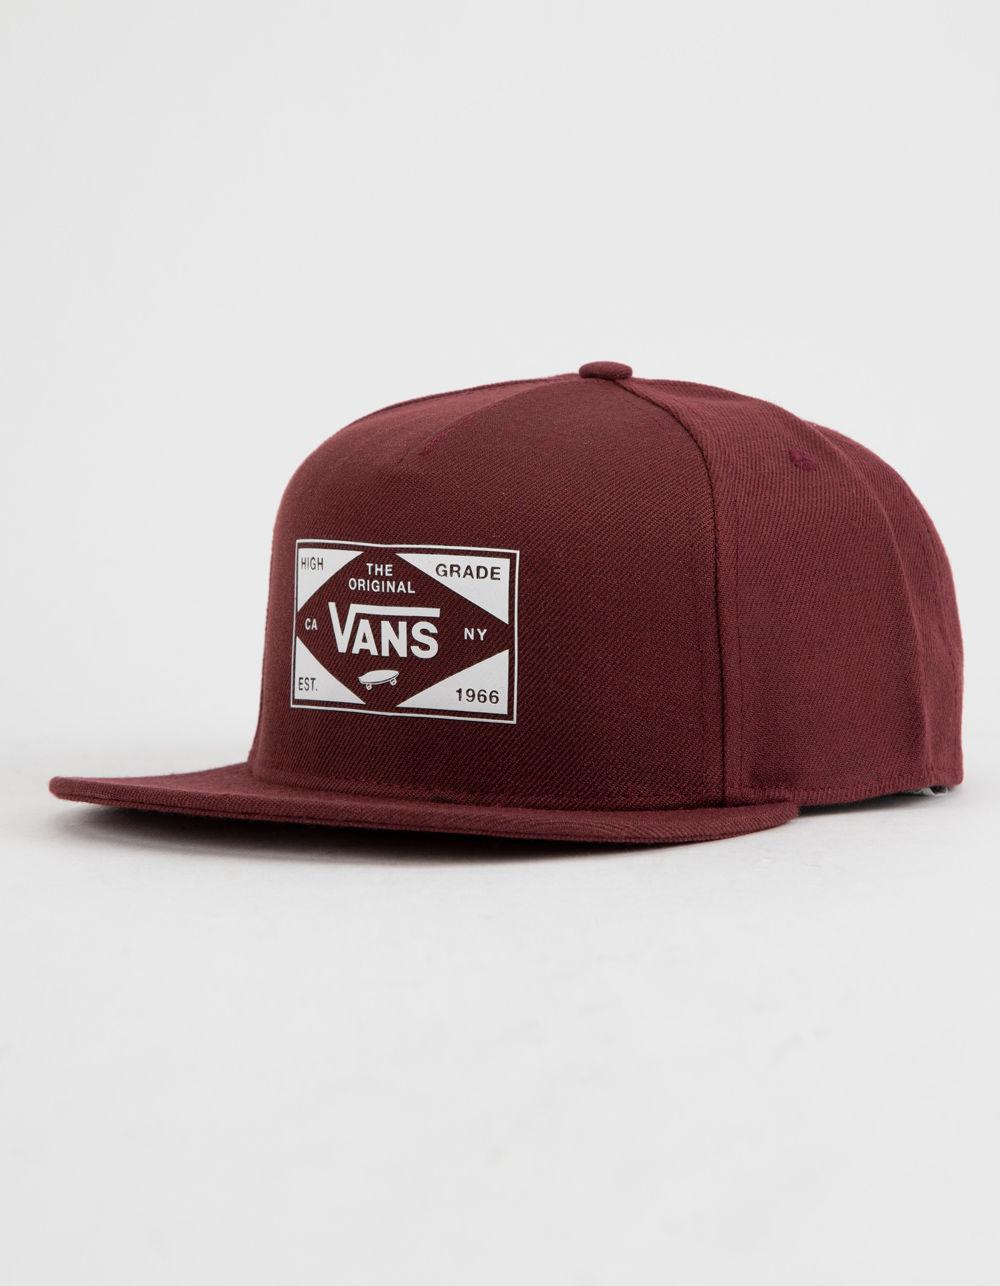 Lyst - Vans Best In Class Mens Snapback Hat in Red for Men 78efbf8a1